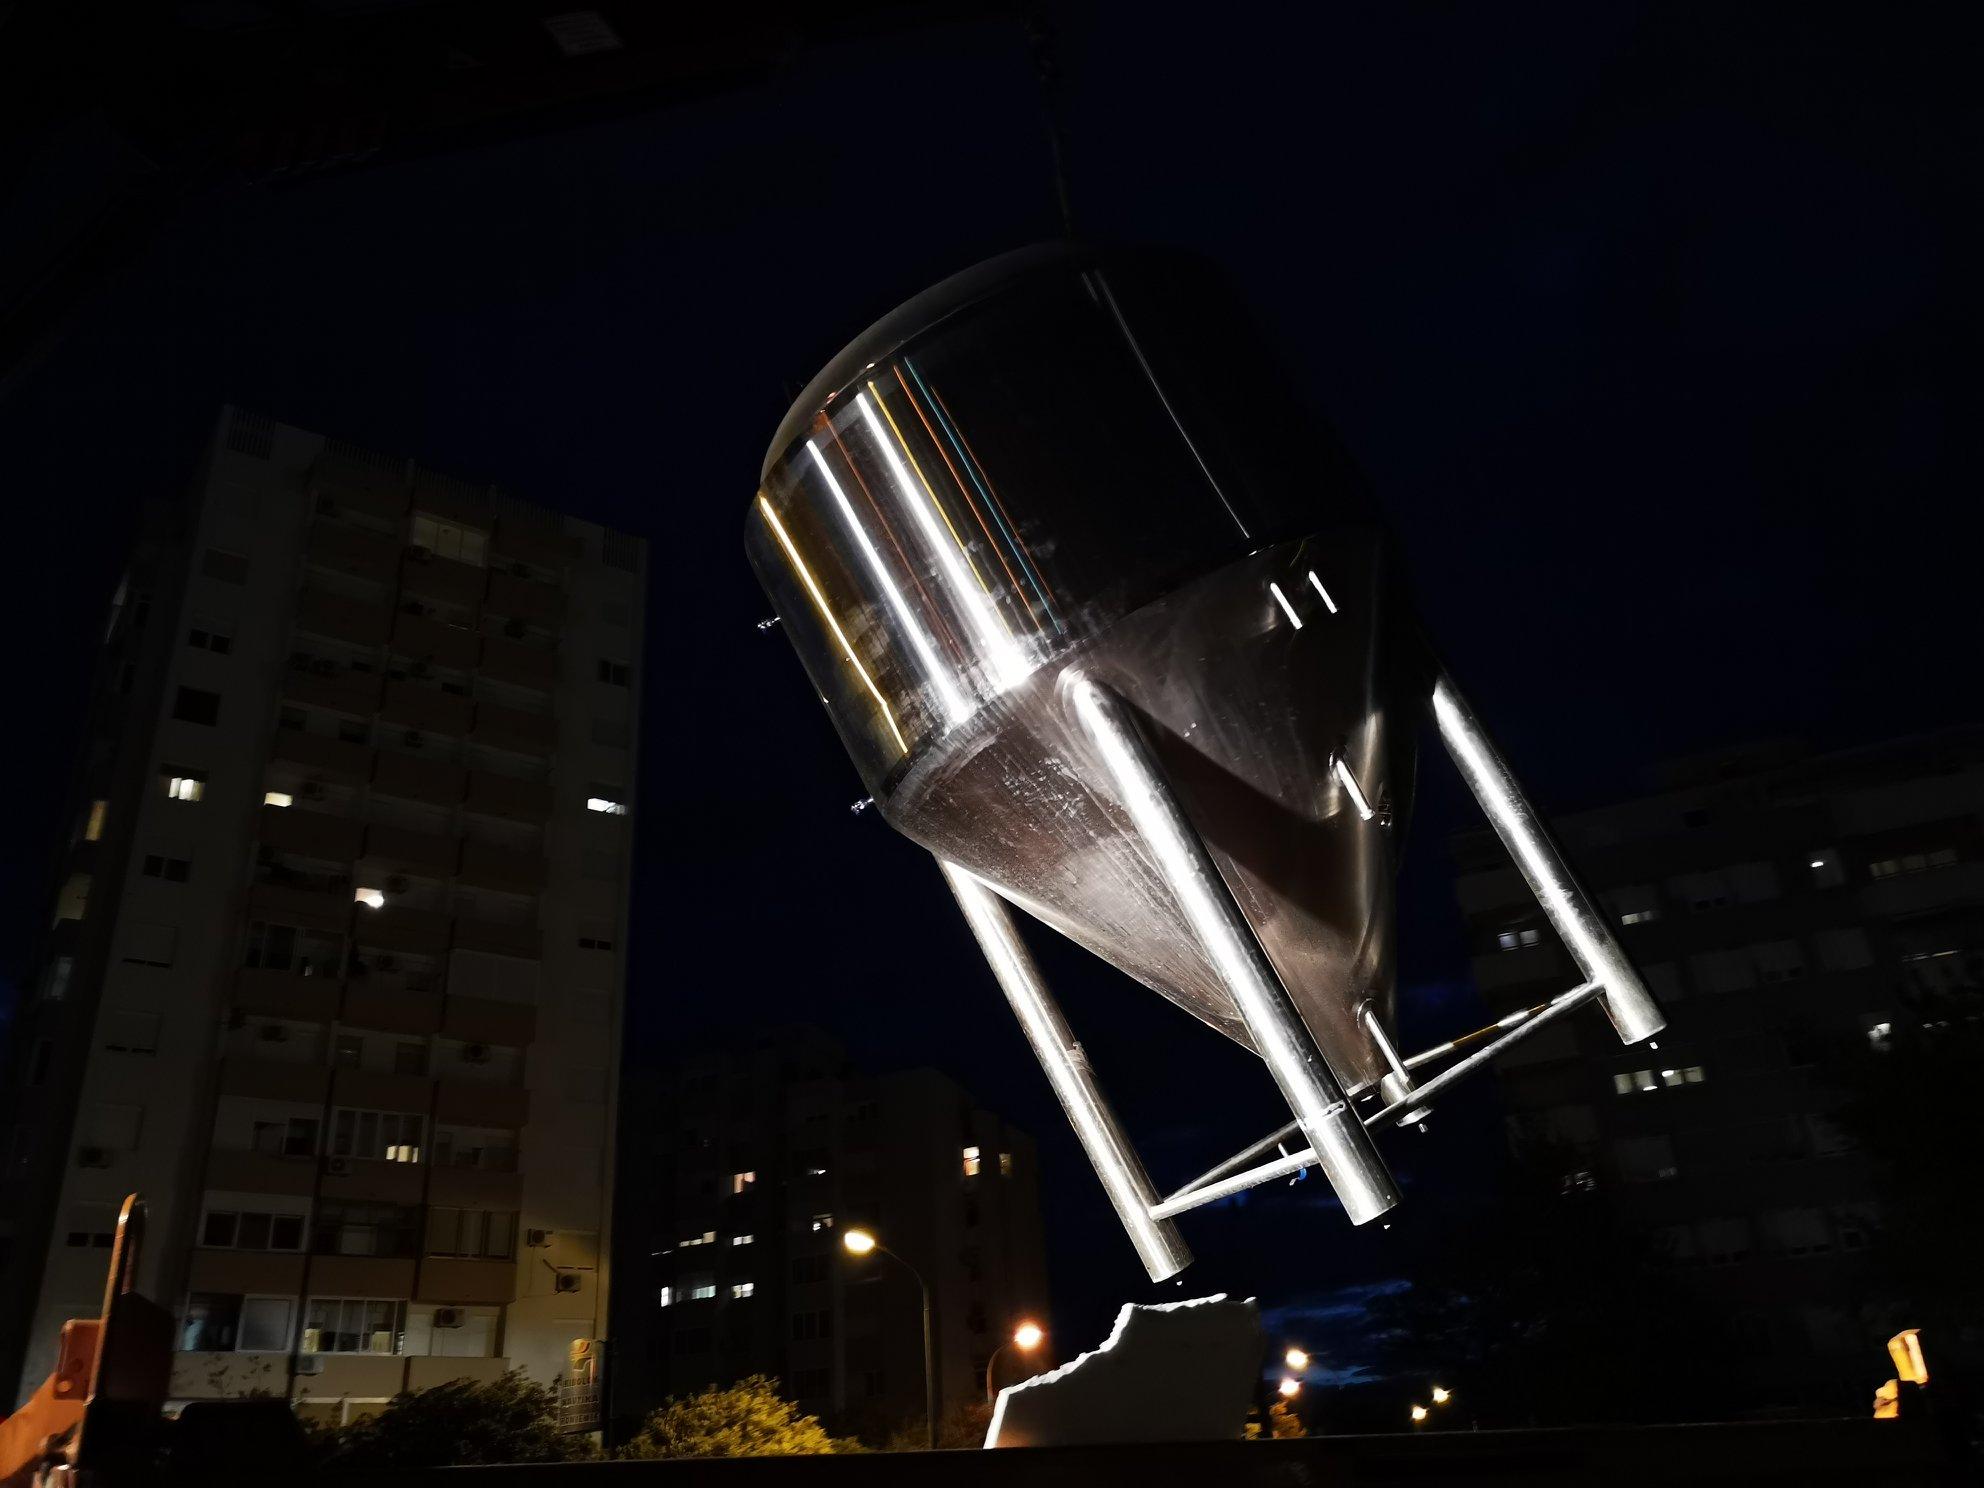 prizor selidbe pivovare